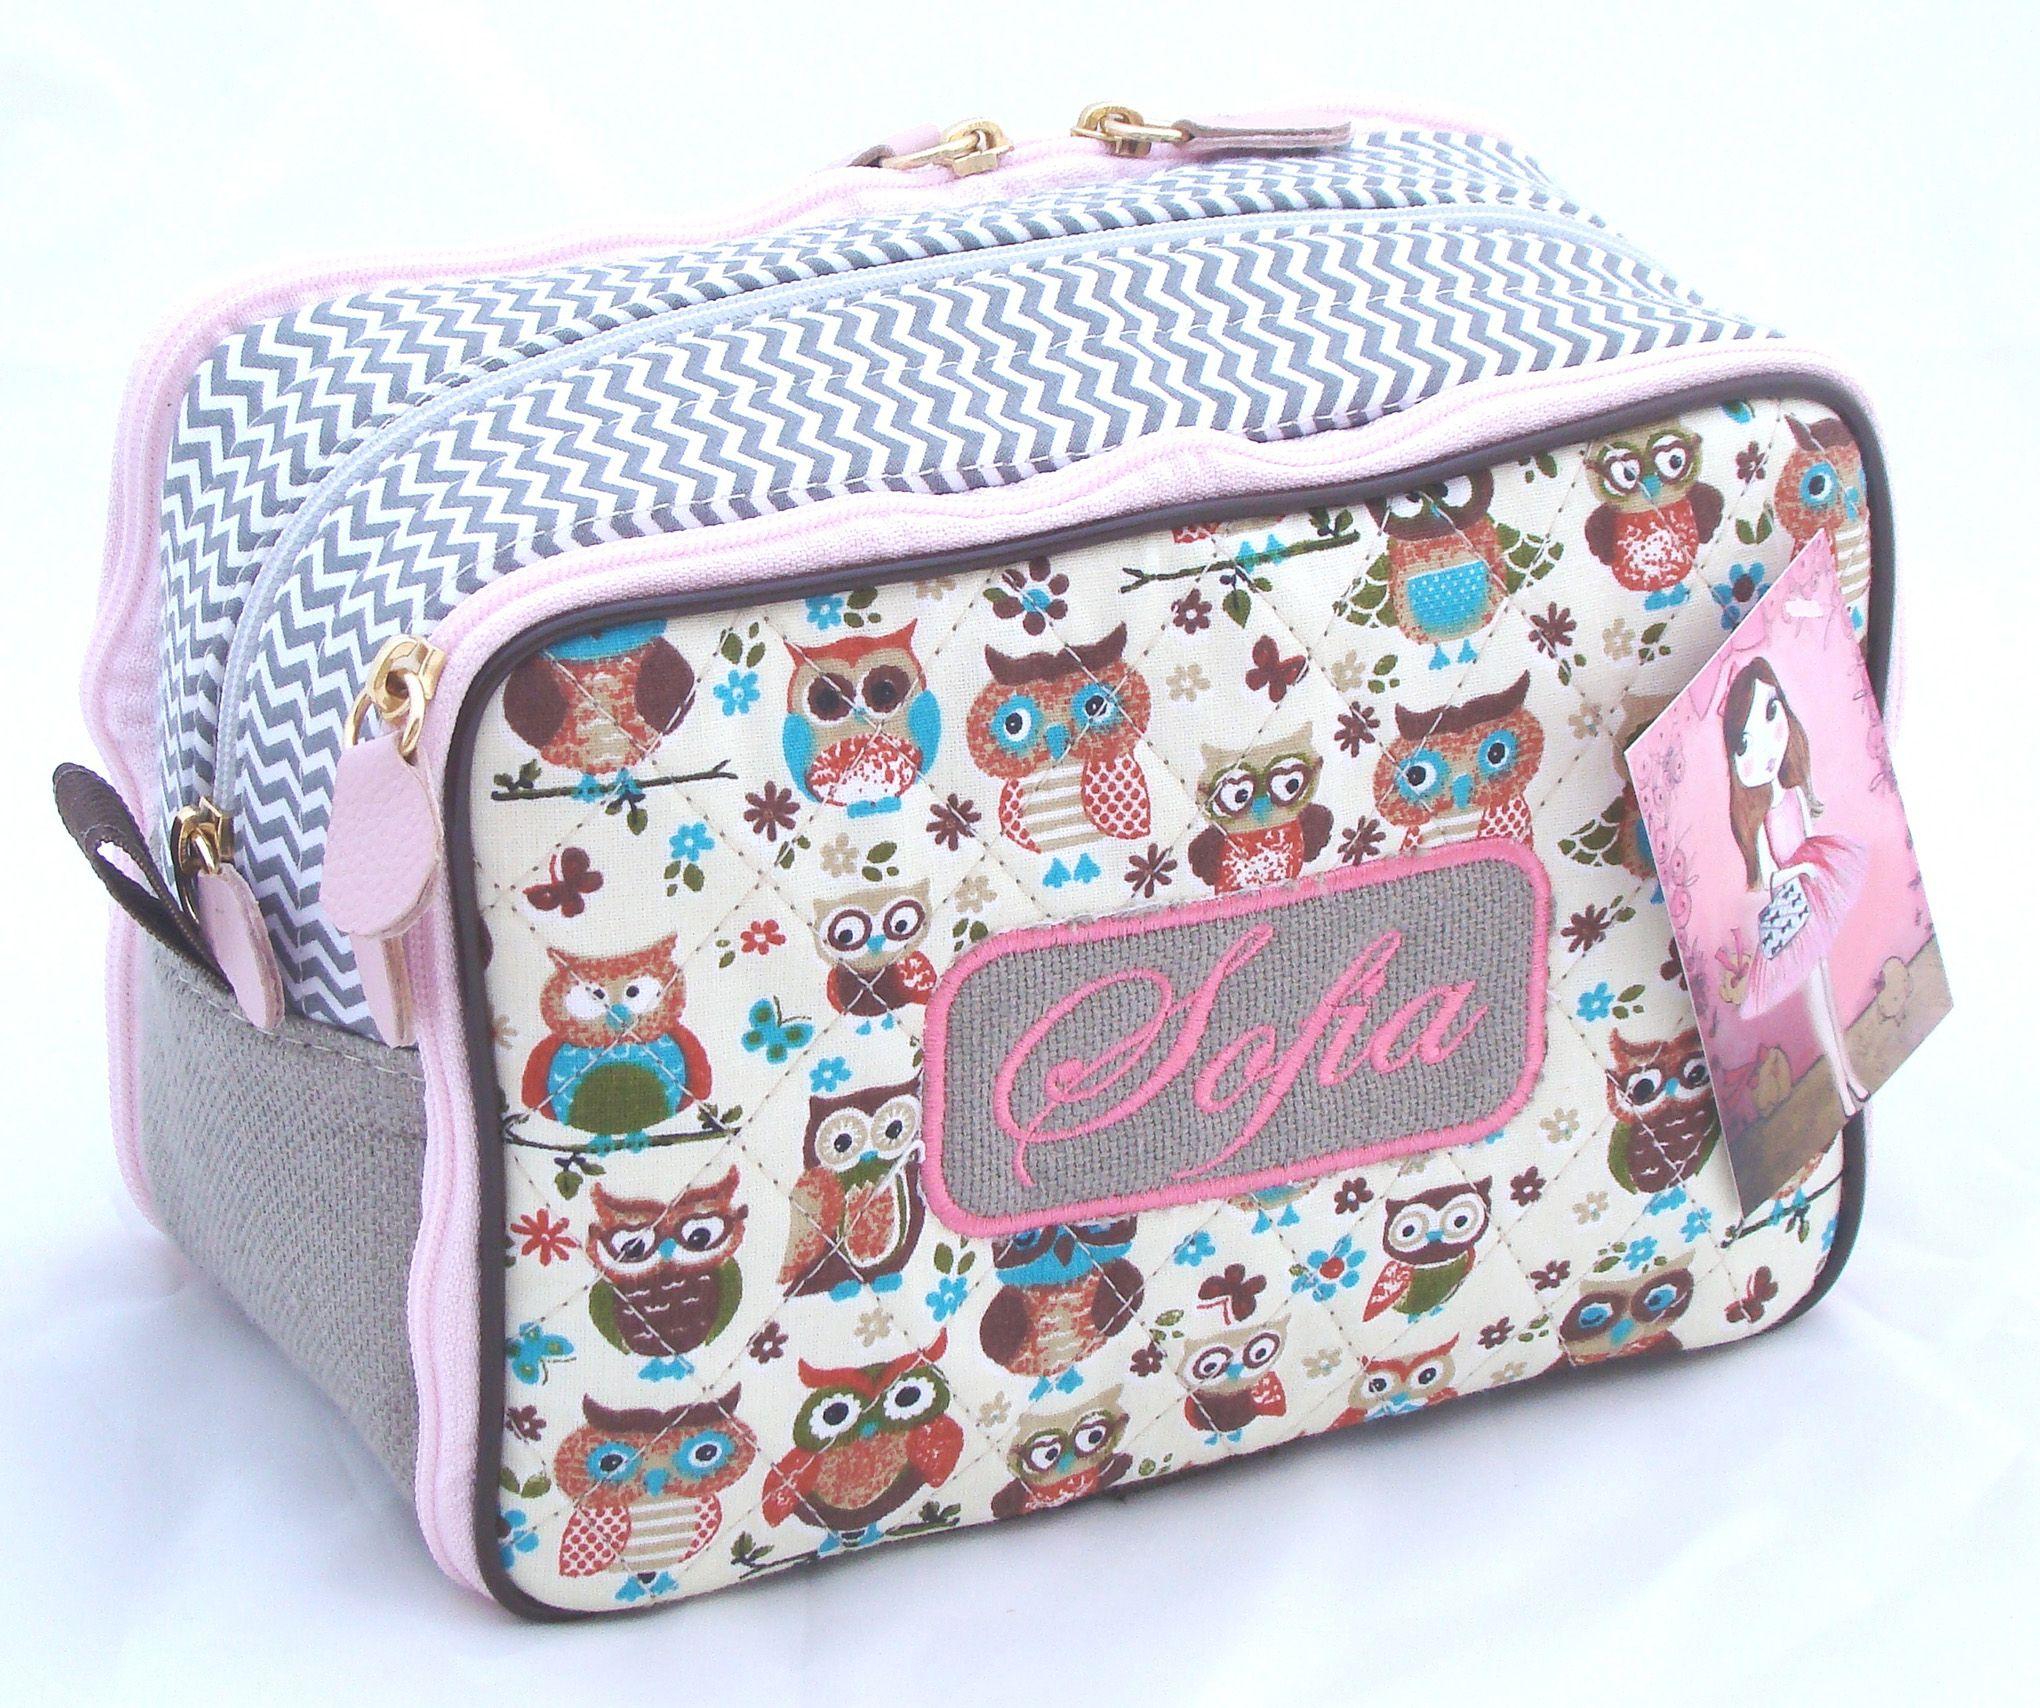 5dcc6ac5d Estojo escolar personalizado www.puppen.com.br | Bags | Fabric dolls ...